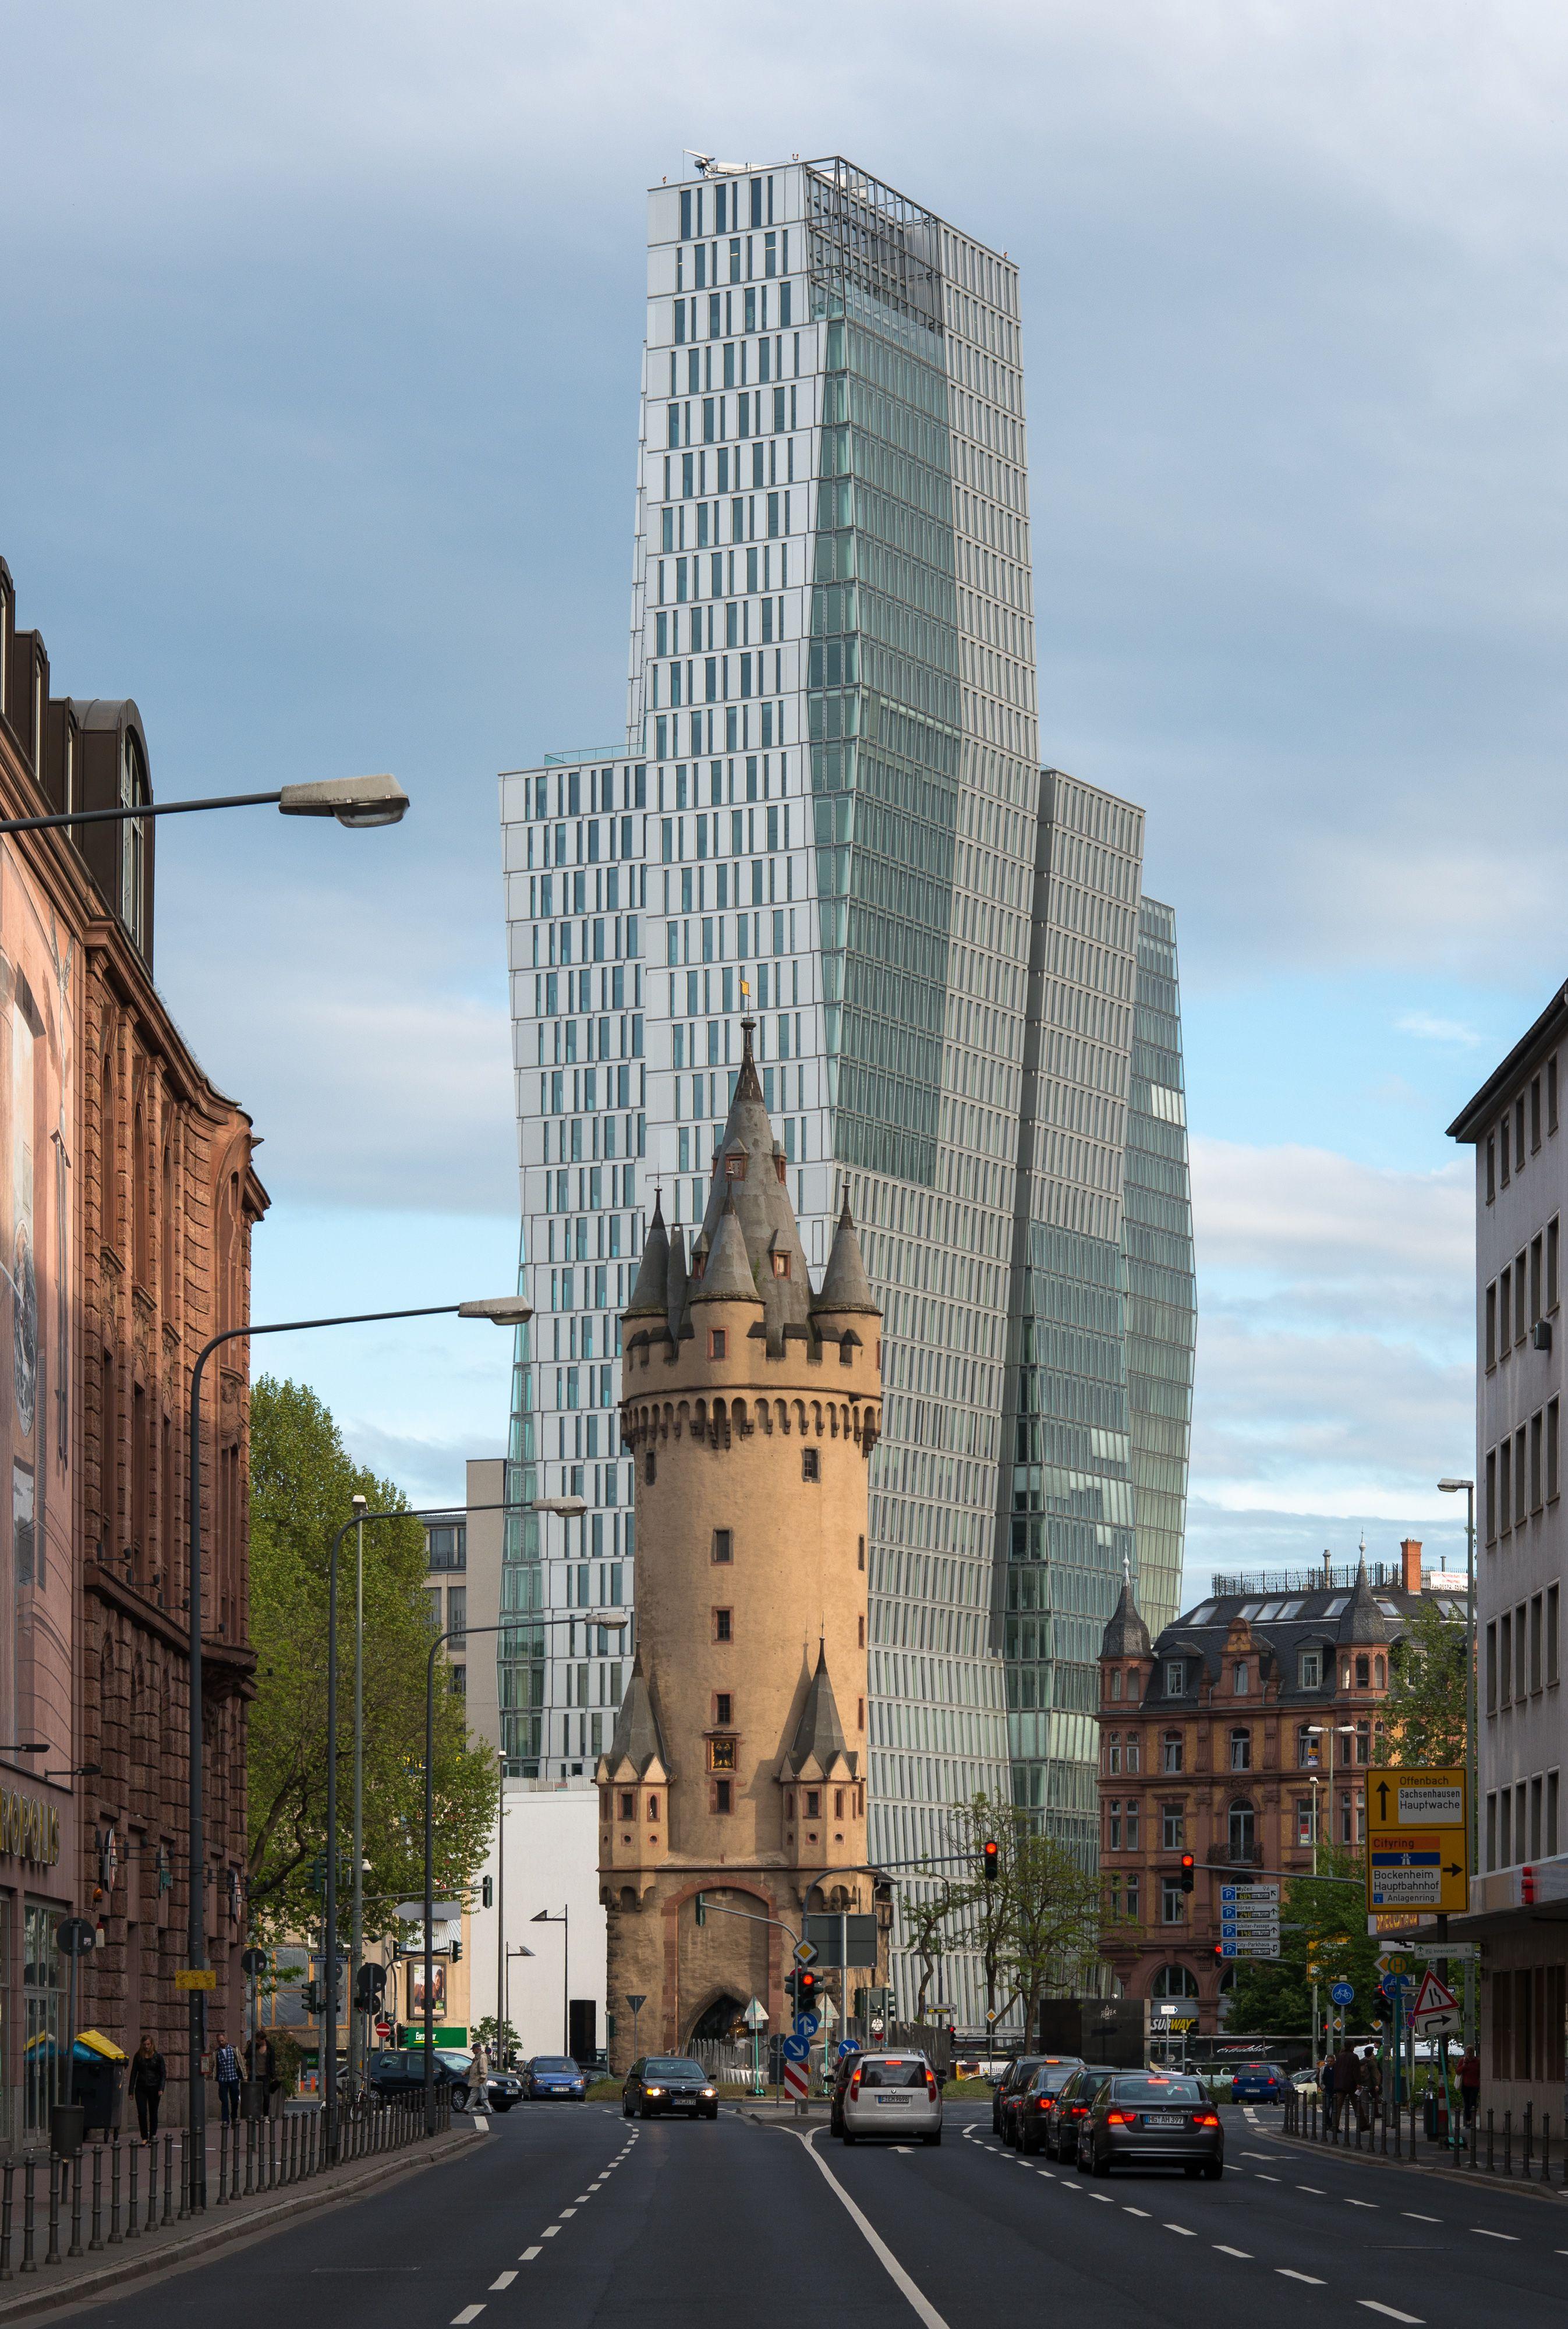 Fun V R Young Frankfurt Am Main Tower Germany